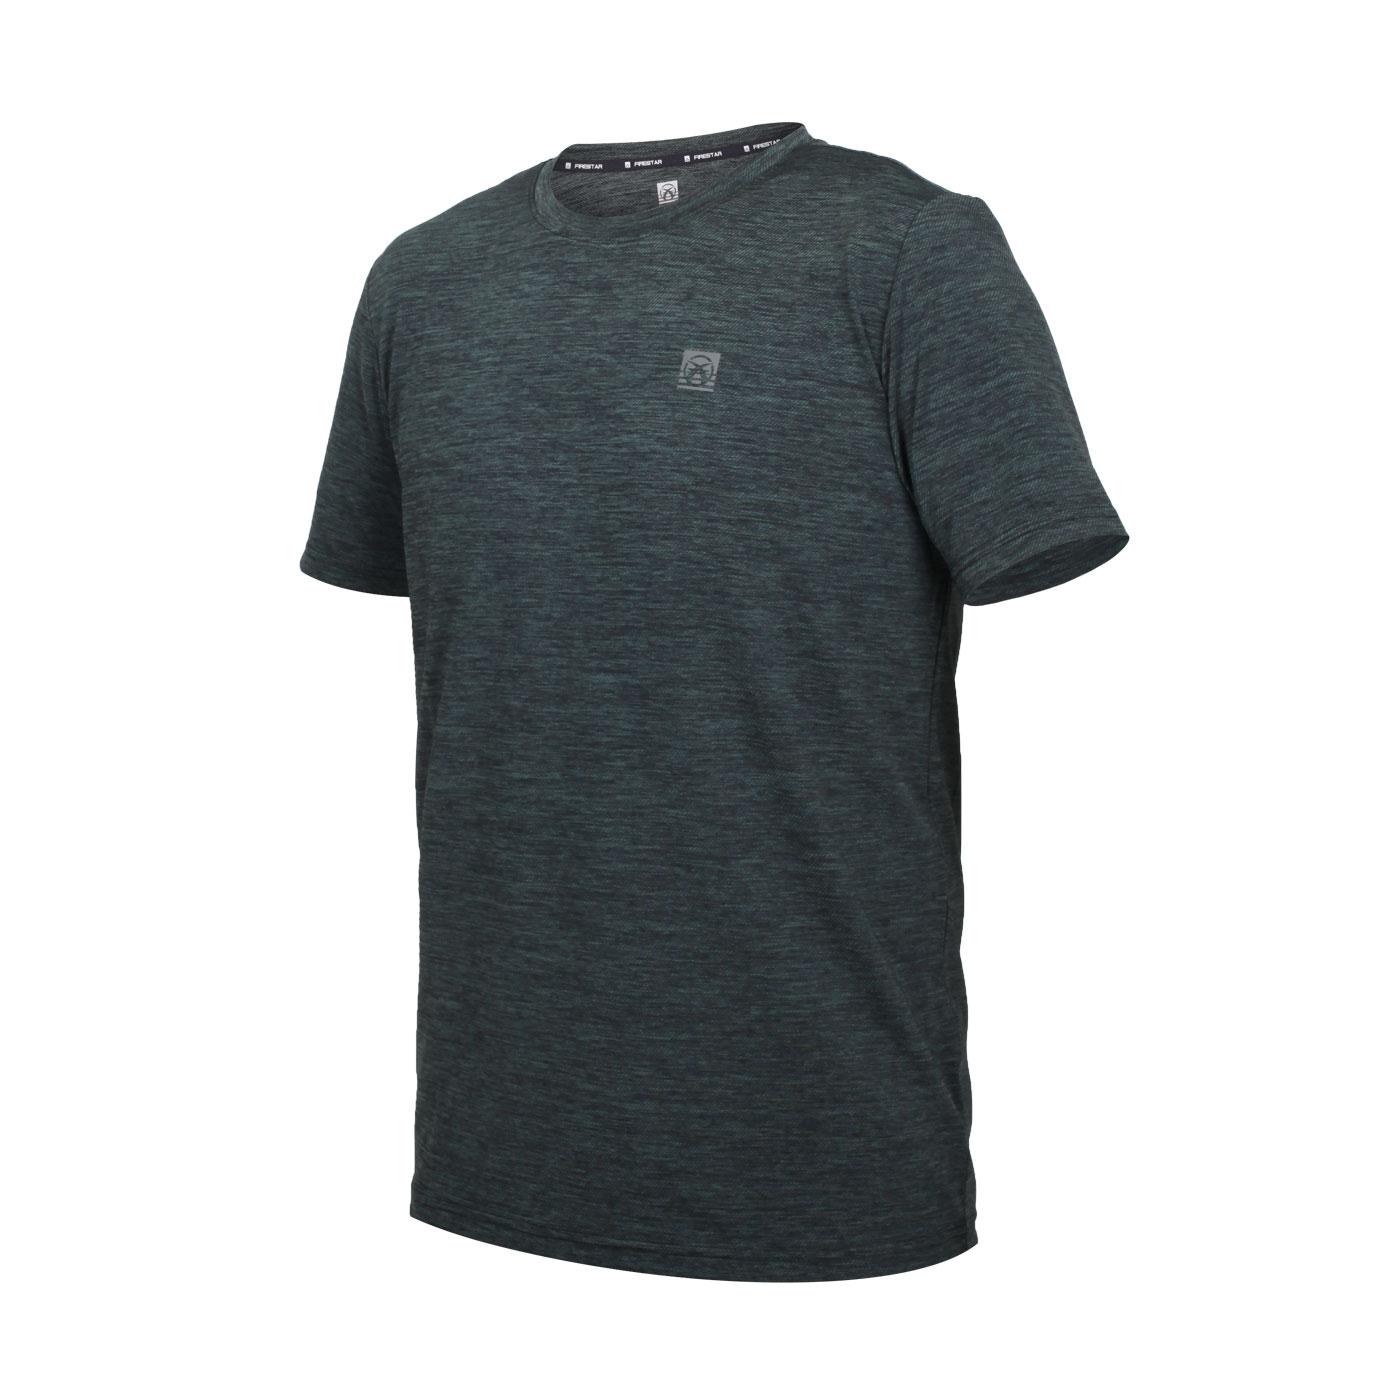 FIRESTAR 男款彈性機能圓領T恤 D1731-18